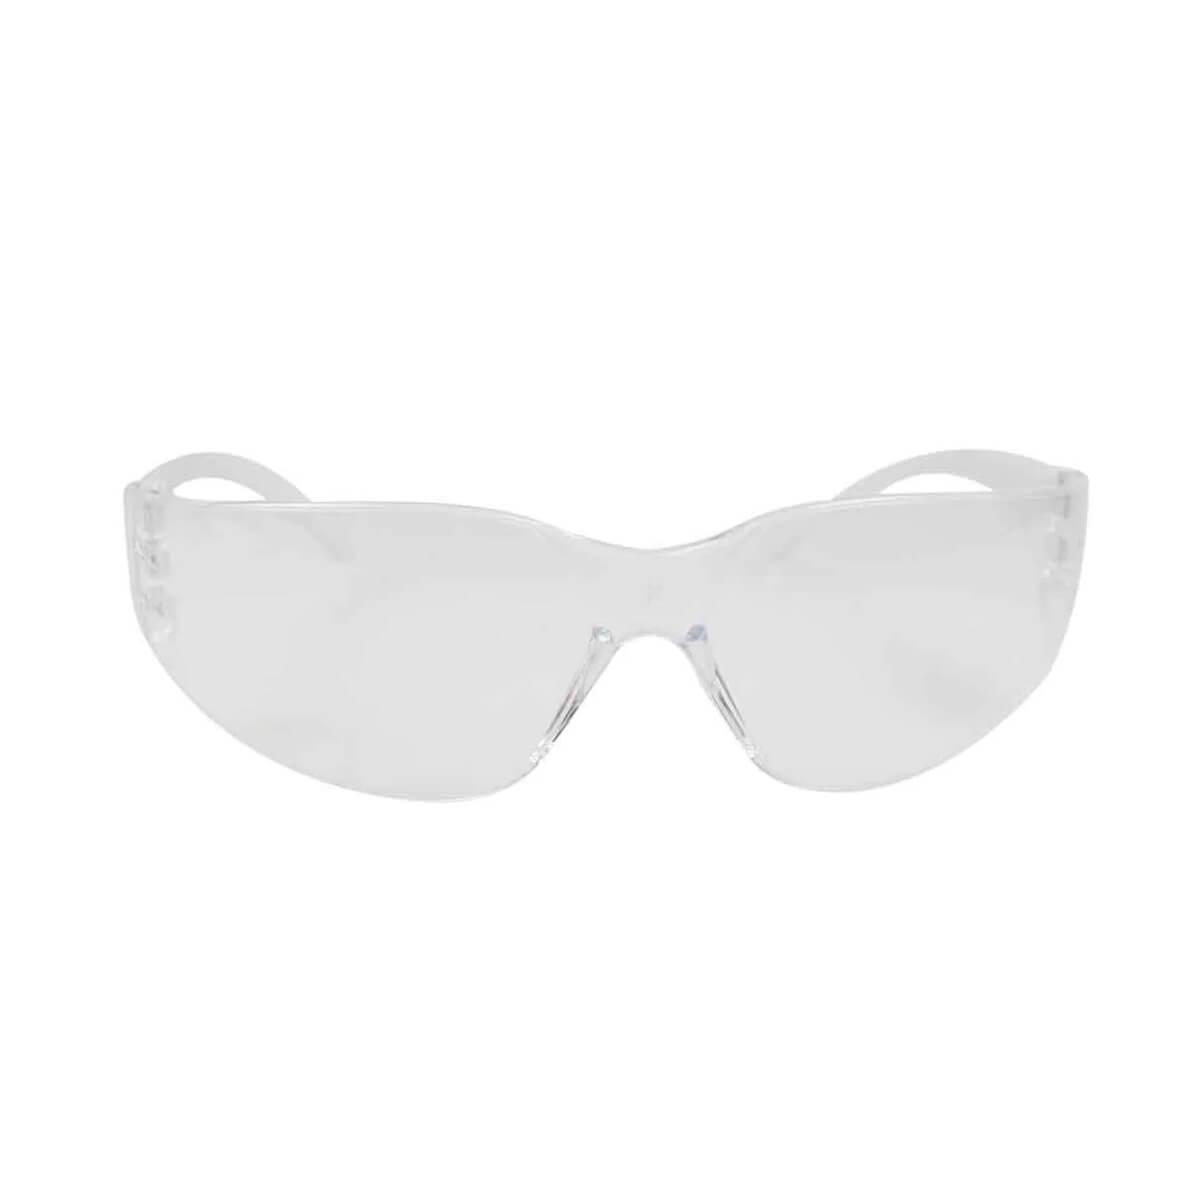 Óculos De Segurança Incolor Policarbonato Leopardo - Kalipso